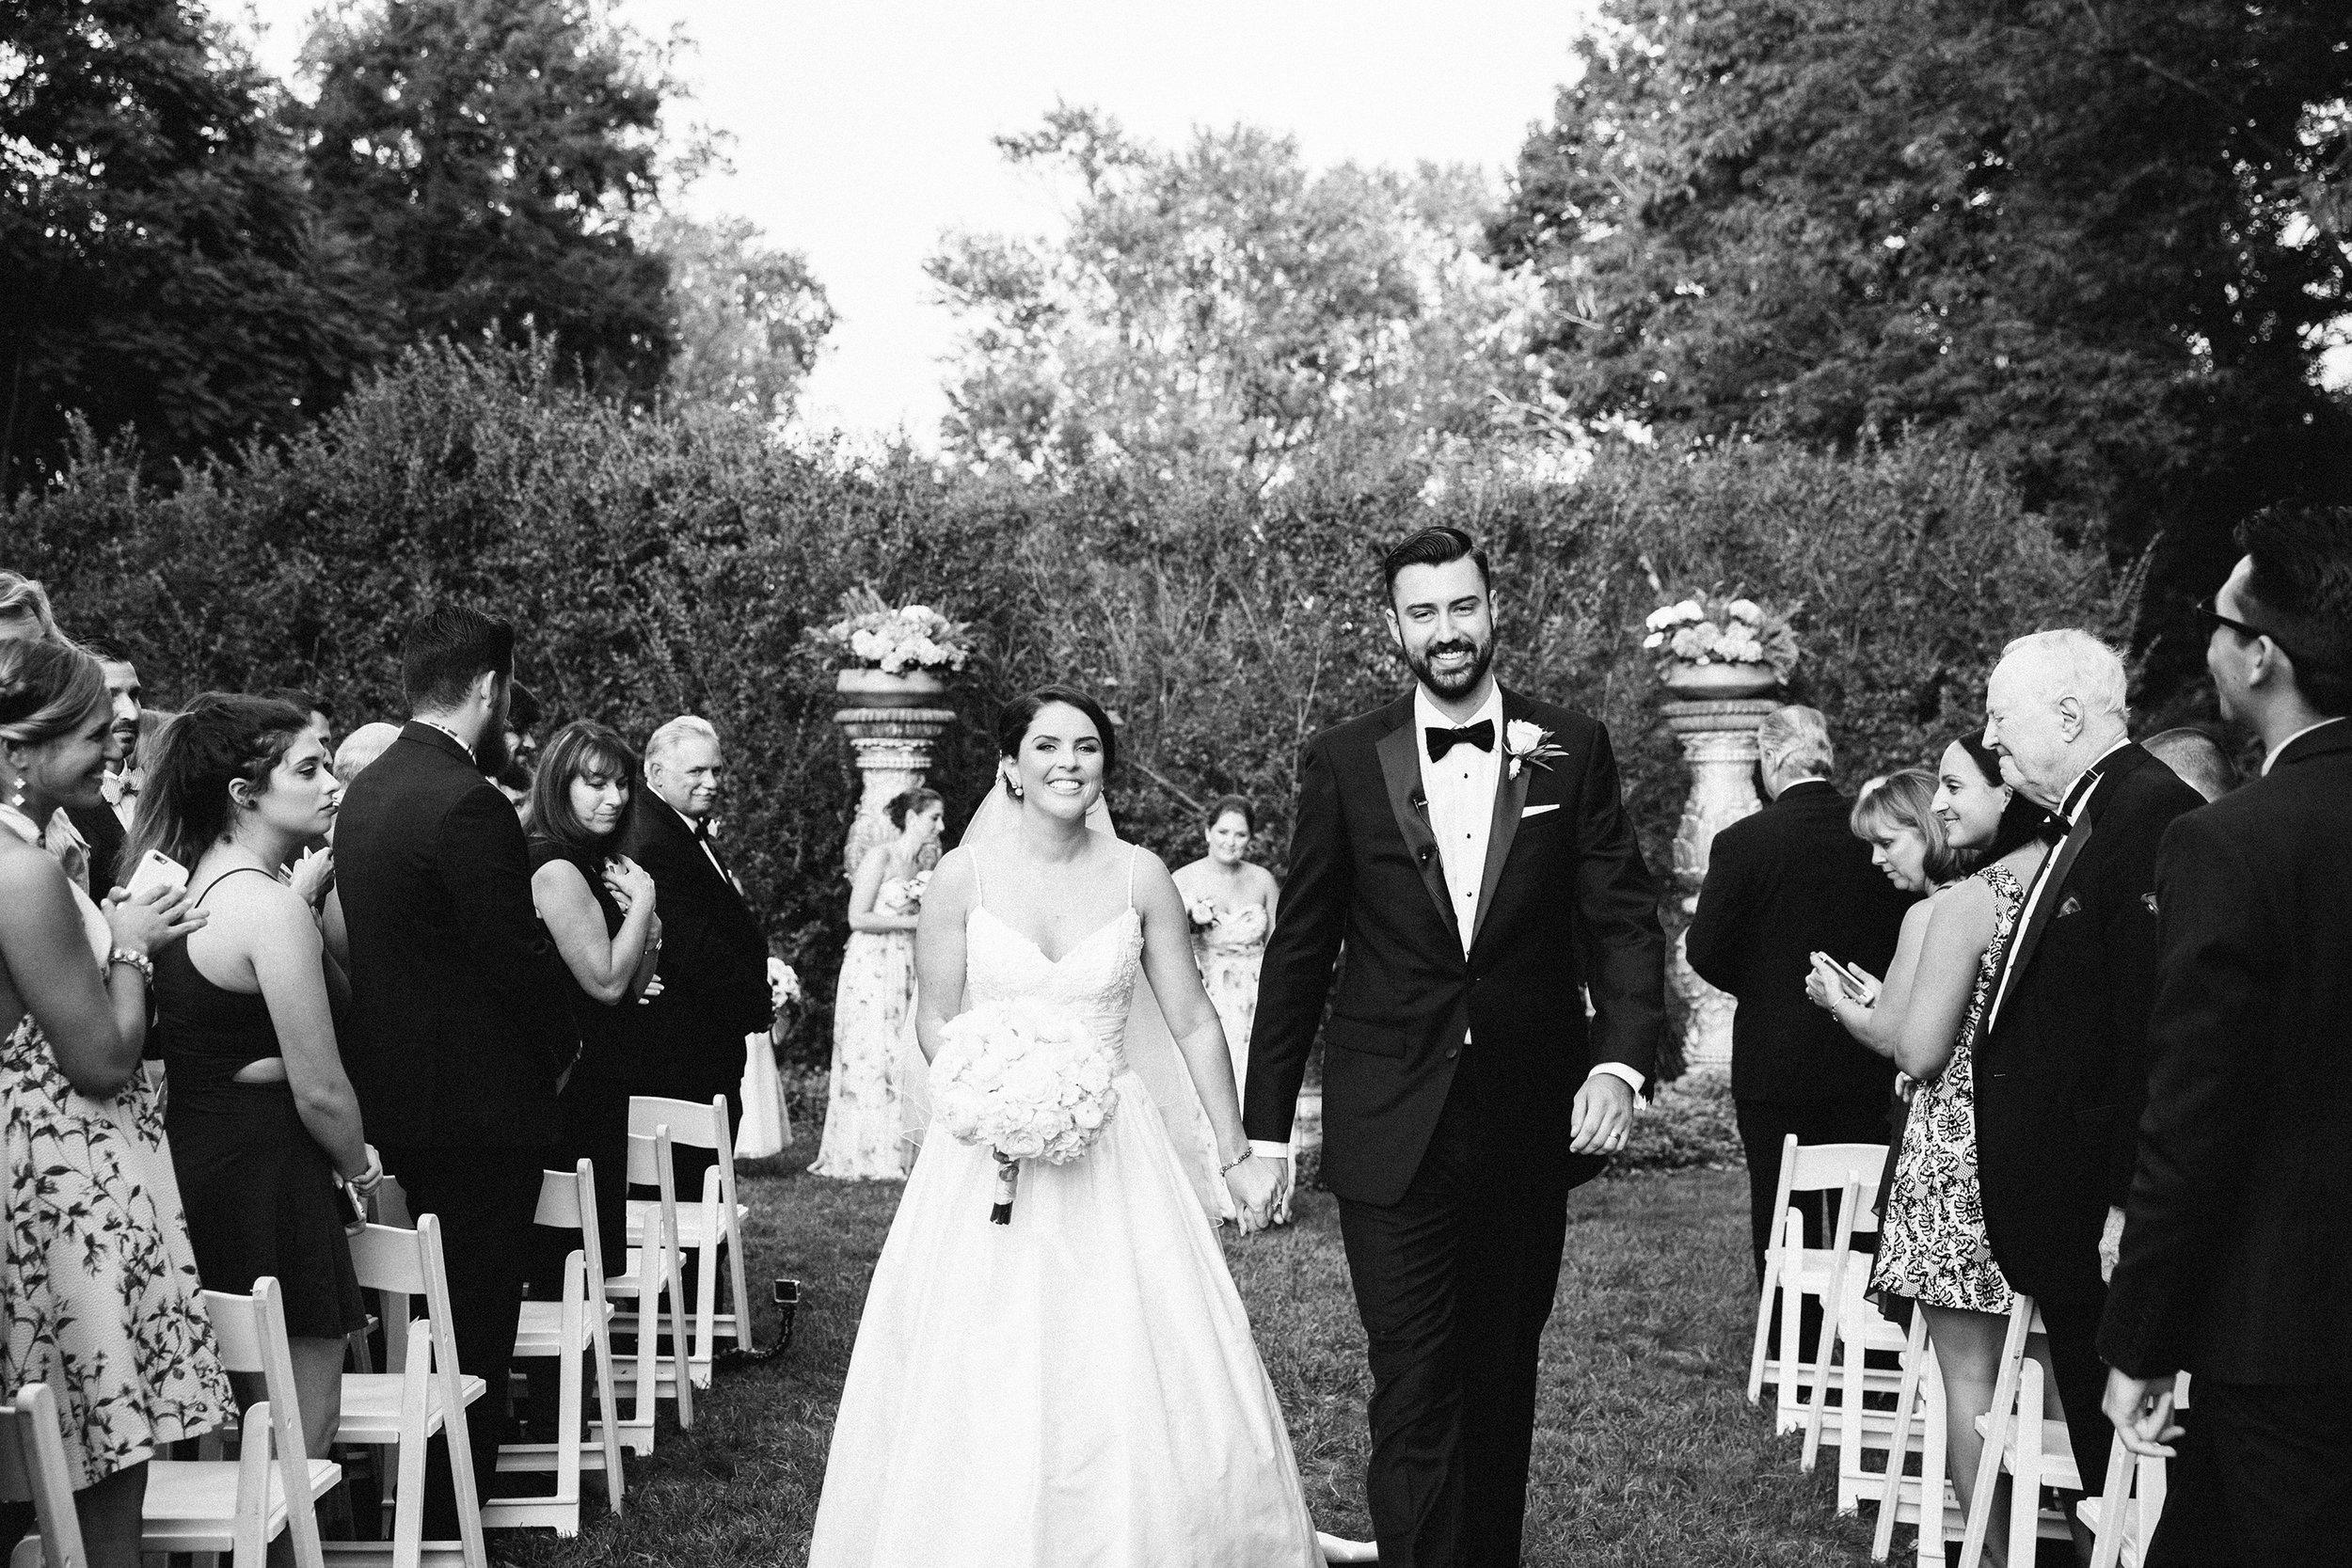 Evergreen-Museum-Balitmore-Maryland-Wedding-Black-Tie-Bride-033.jpg